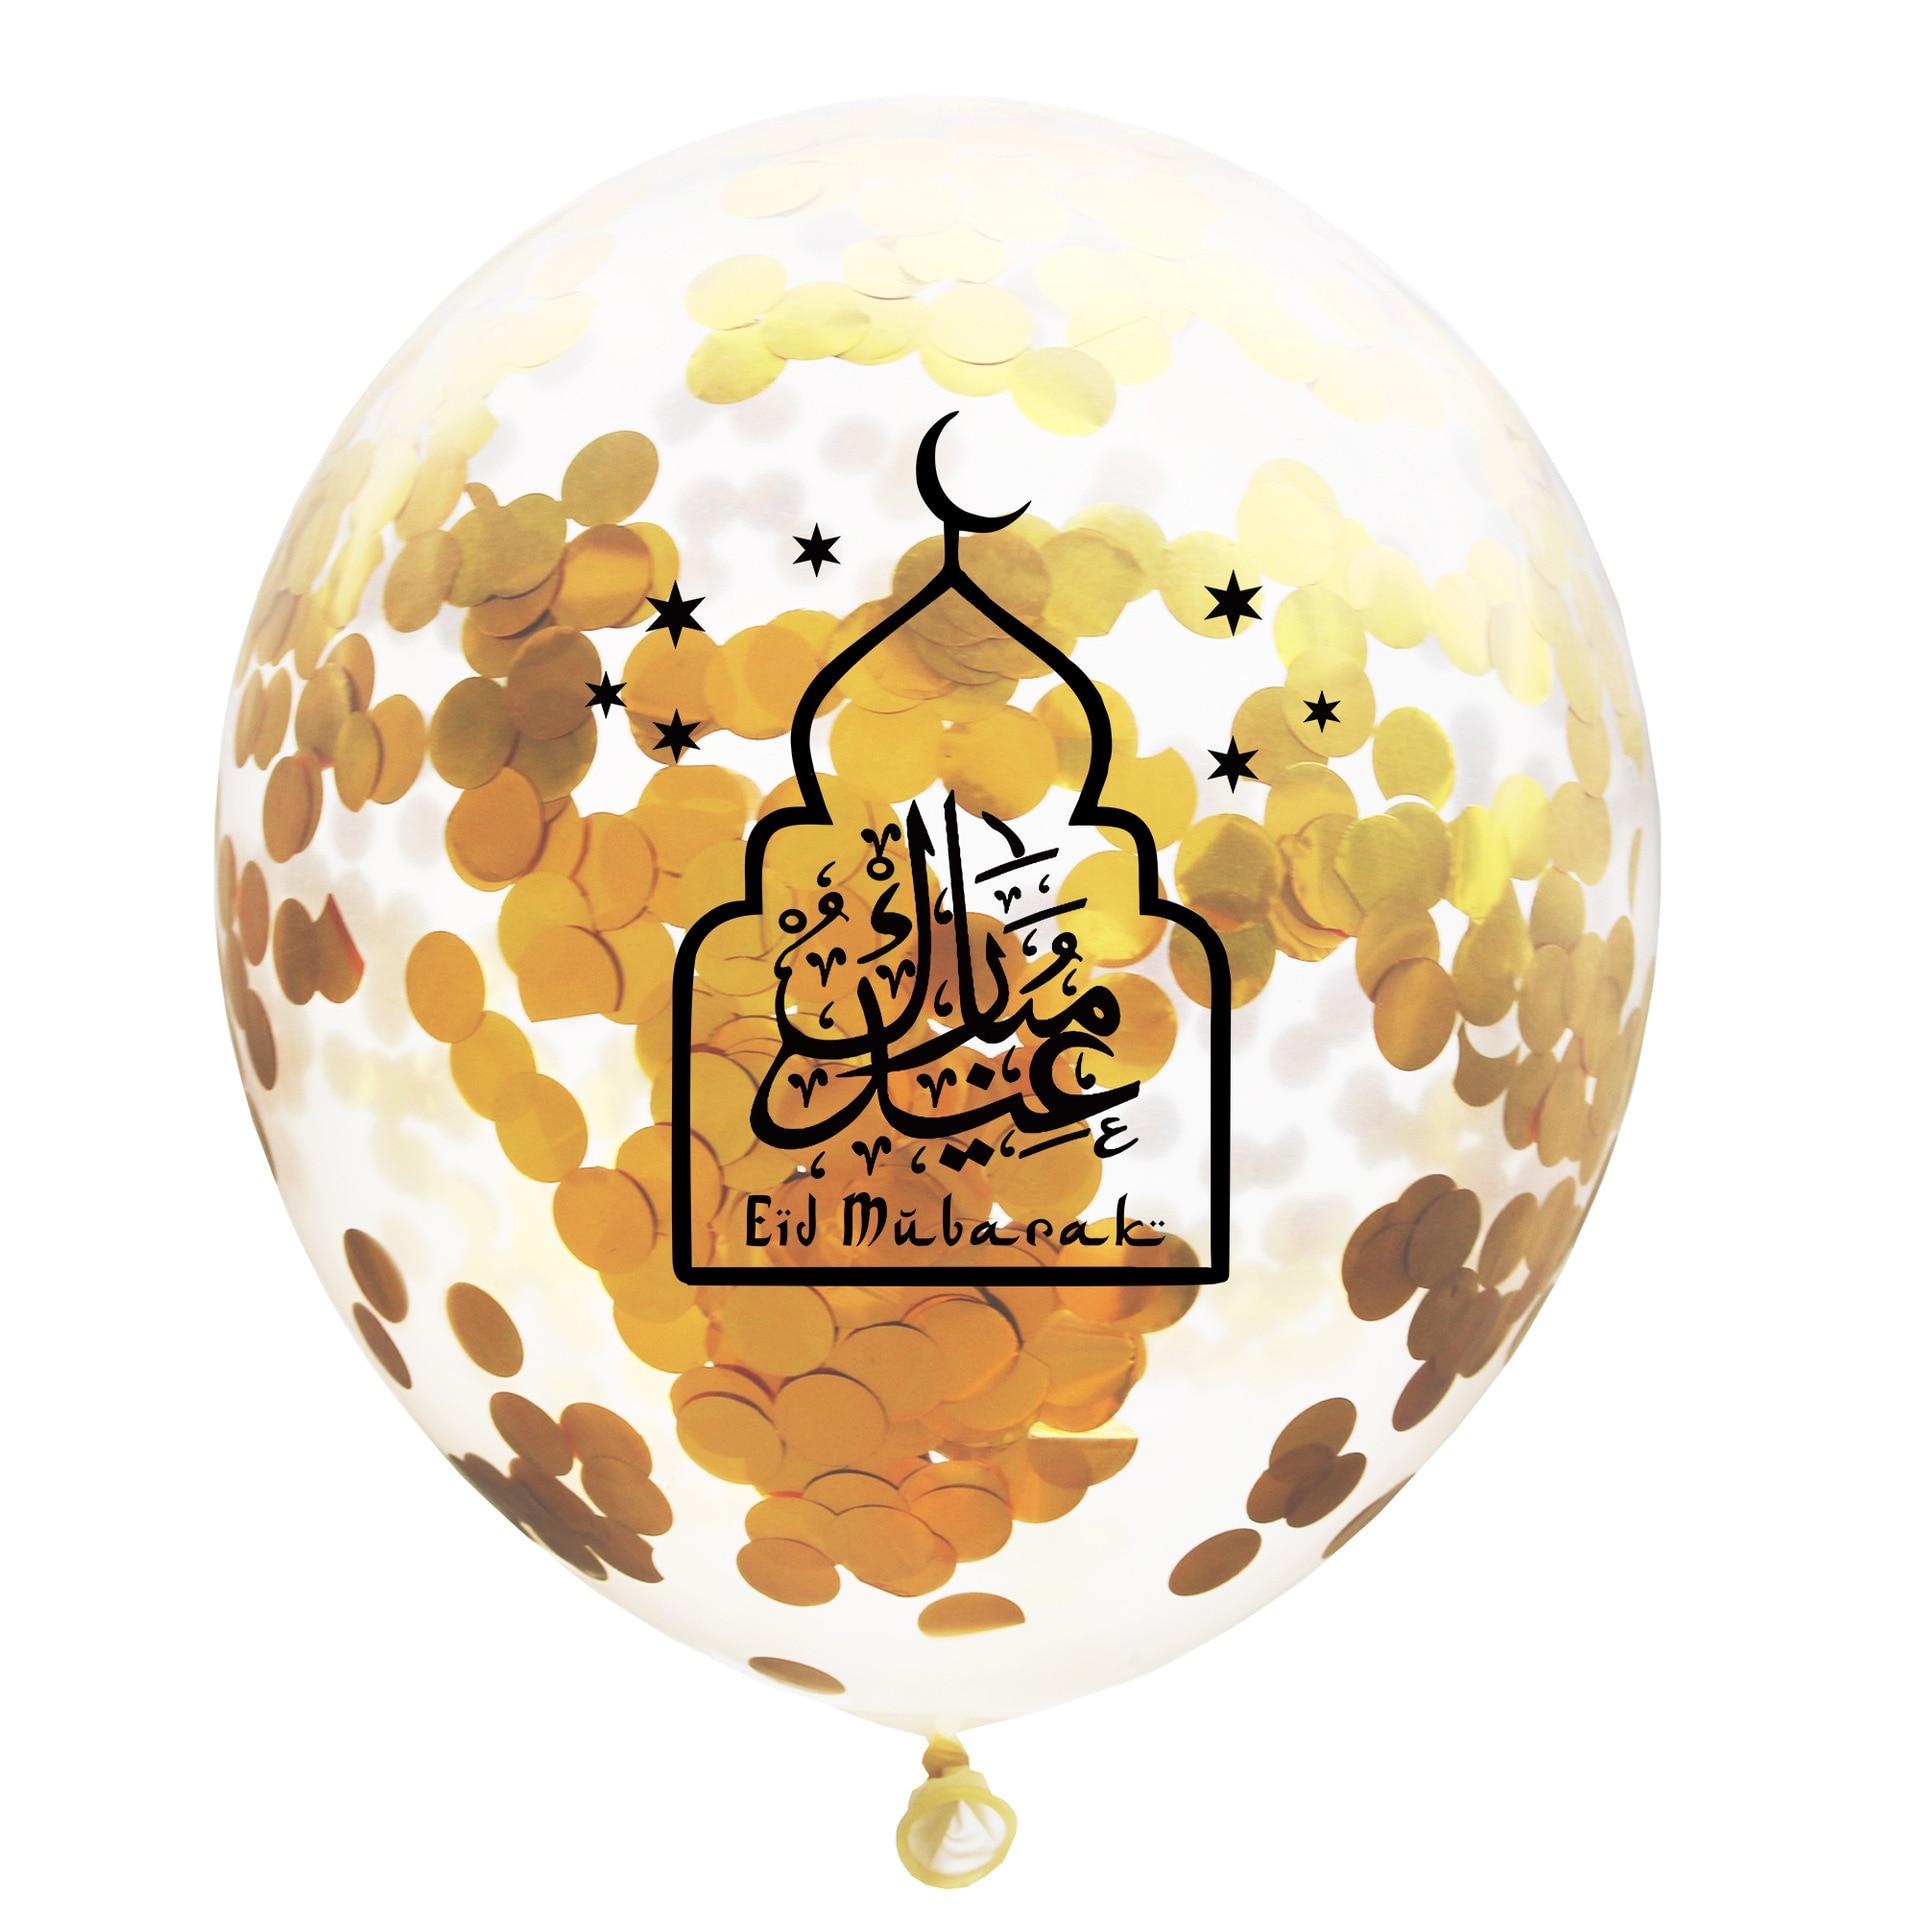 2019 EID MUBARAK Balloons Ramadan Decoration Eid Silver Ballon Helium For Muslim Eid For Party Air Ball Mixed Gold Confetti